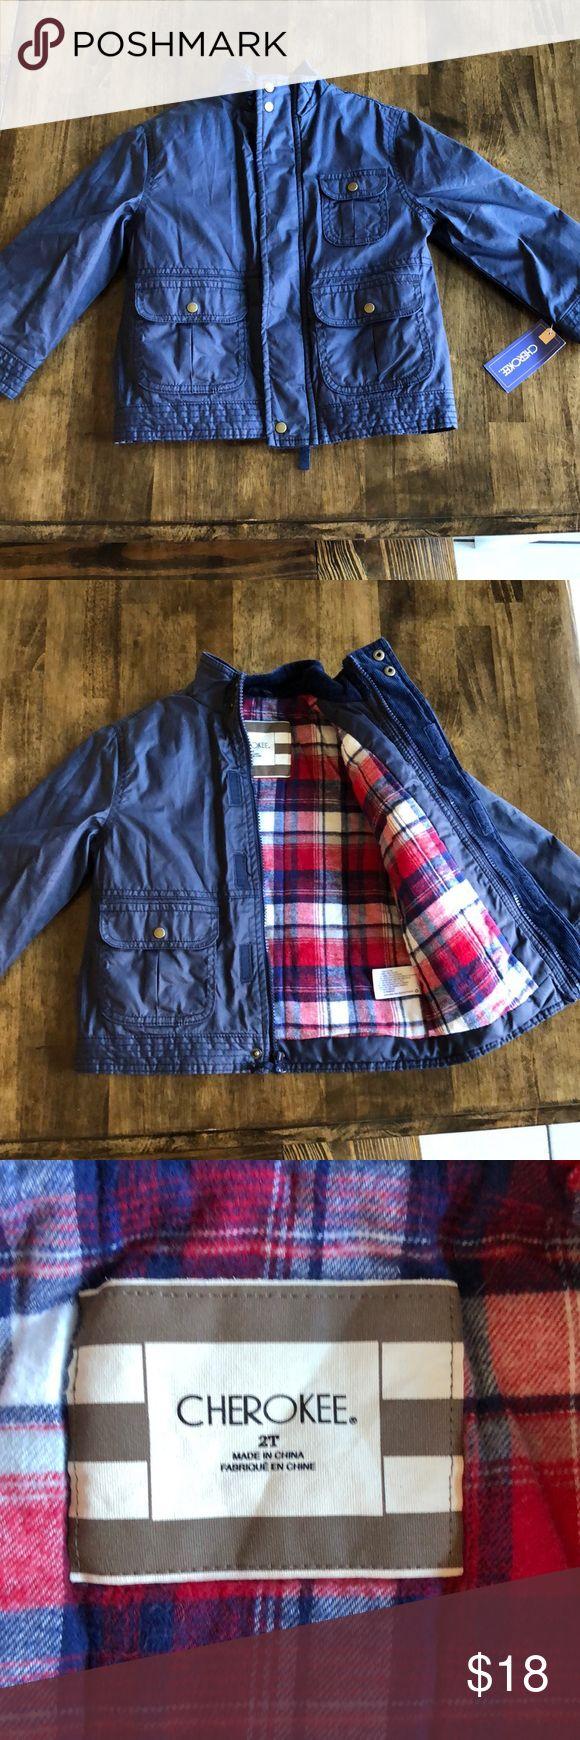 NWT Boys wind and water resistant coat Adorable coat! Fits bigger then a 2t Jackets & Coats